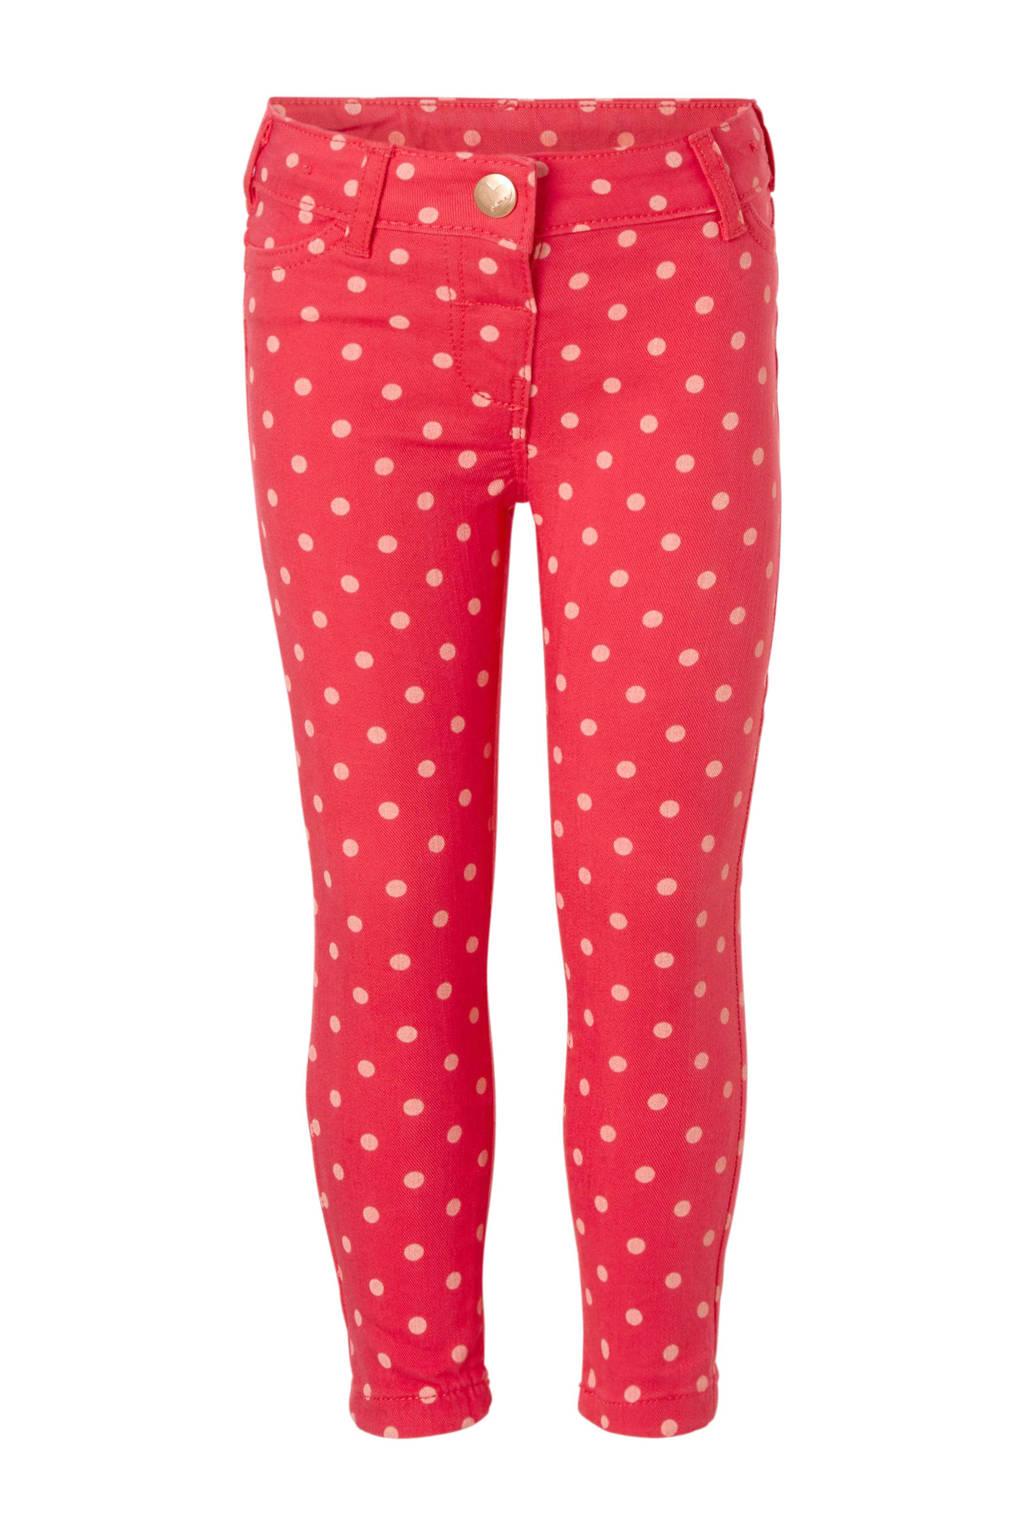 C&A Palomino skinny fit broek met stippen roze, Roze